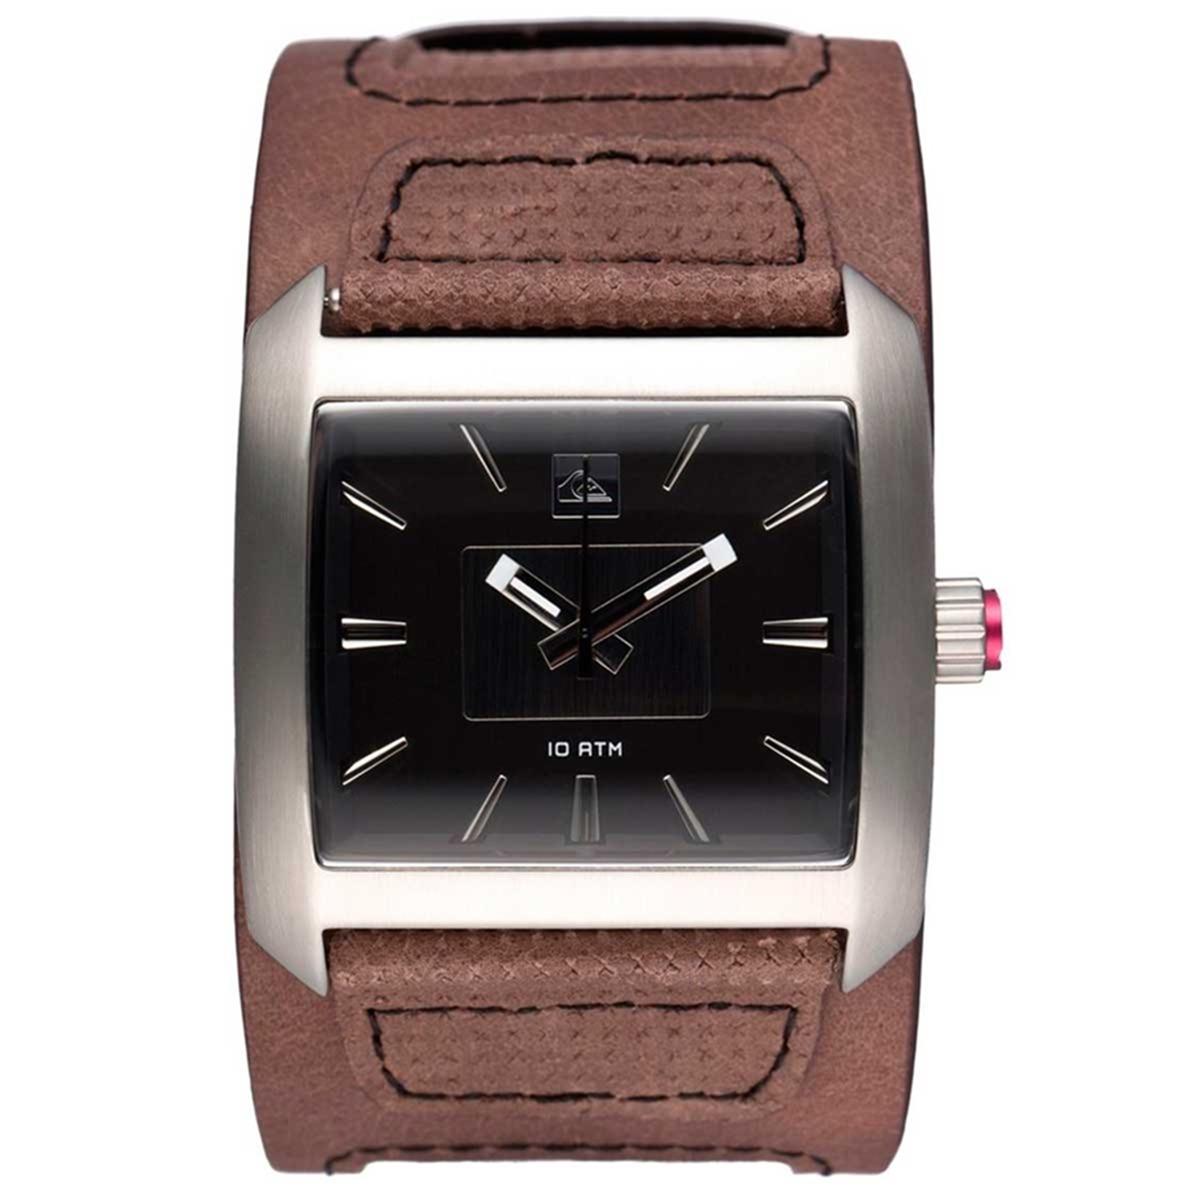 Relógio Quiksilver Sequence Brown - R  490,00 em Mercado Livre de2eec7602